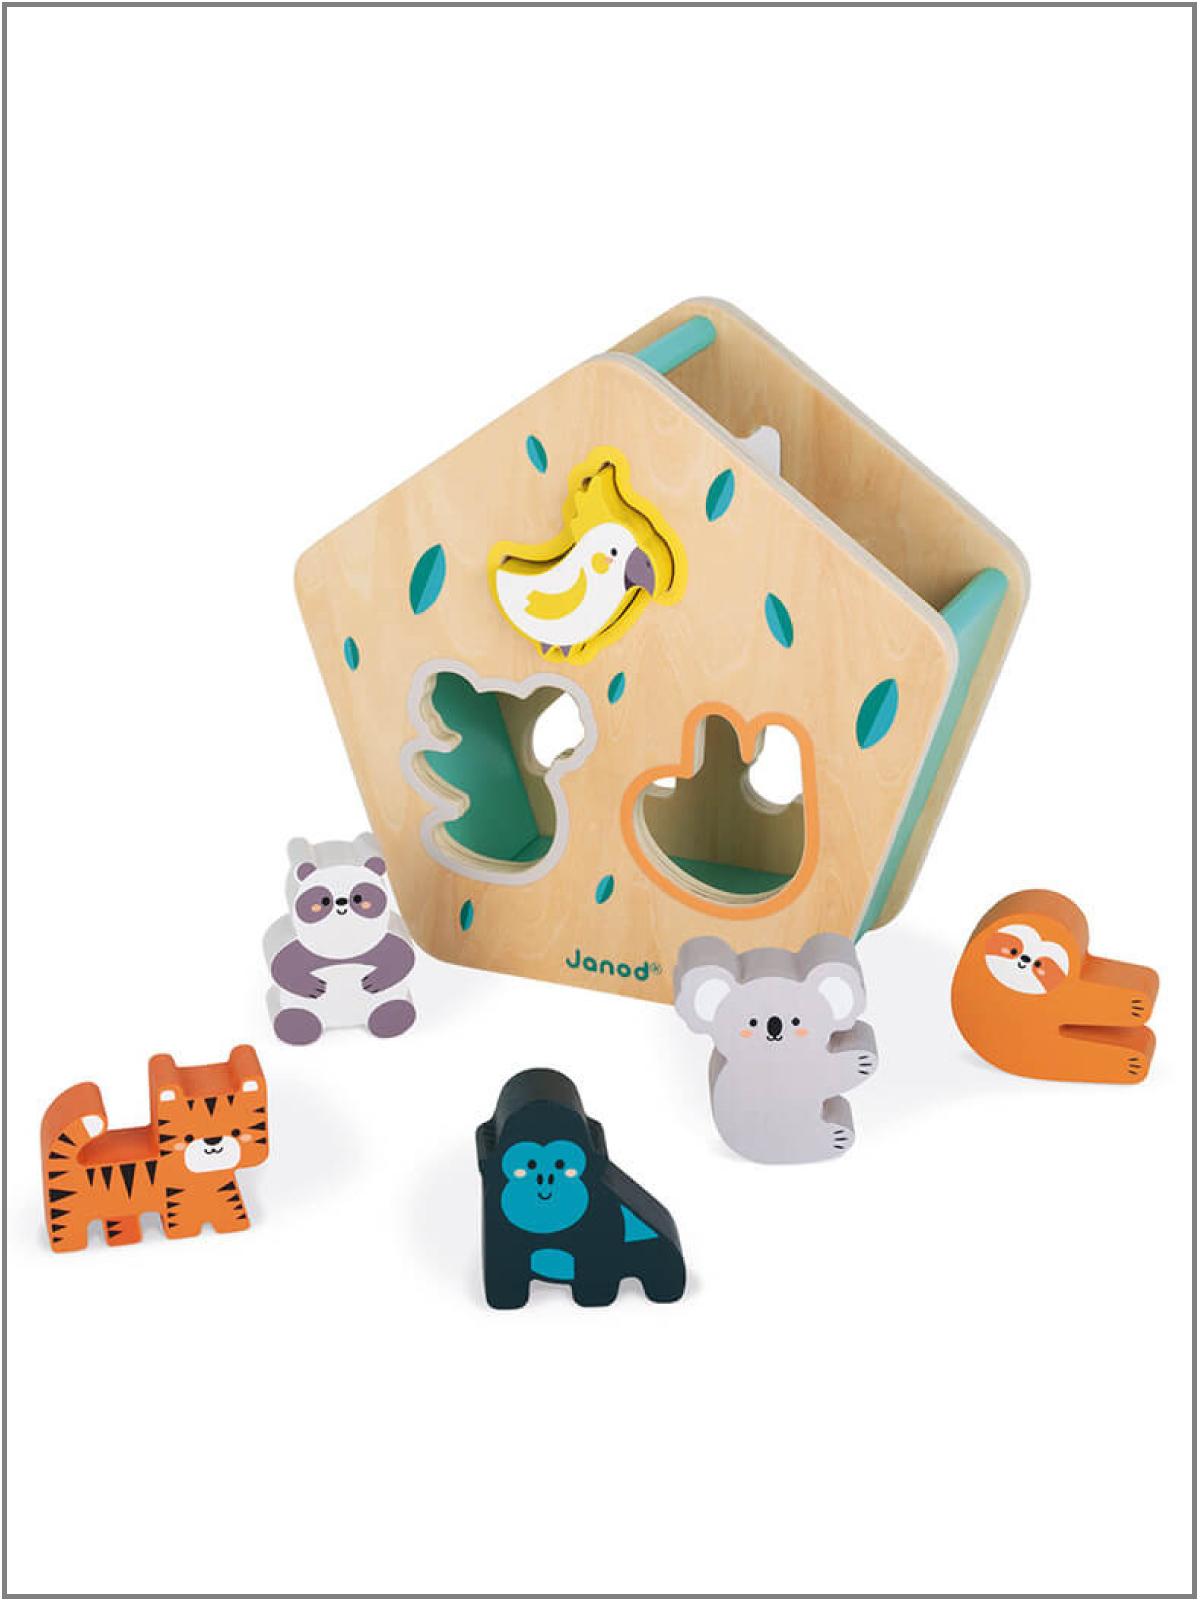 frederickandsophie-kids-toys-janod-france-shape-sorter-animals-jungle-WWF-play